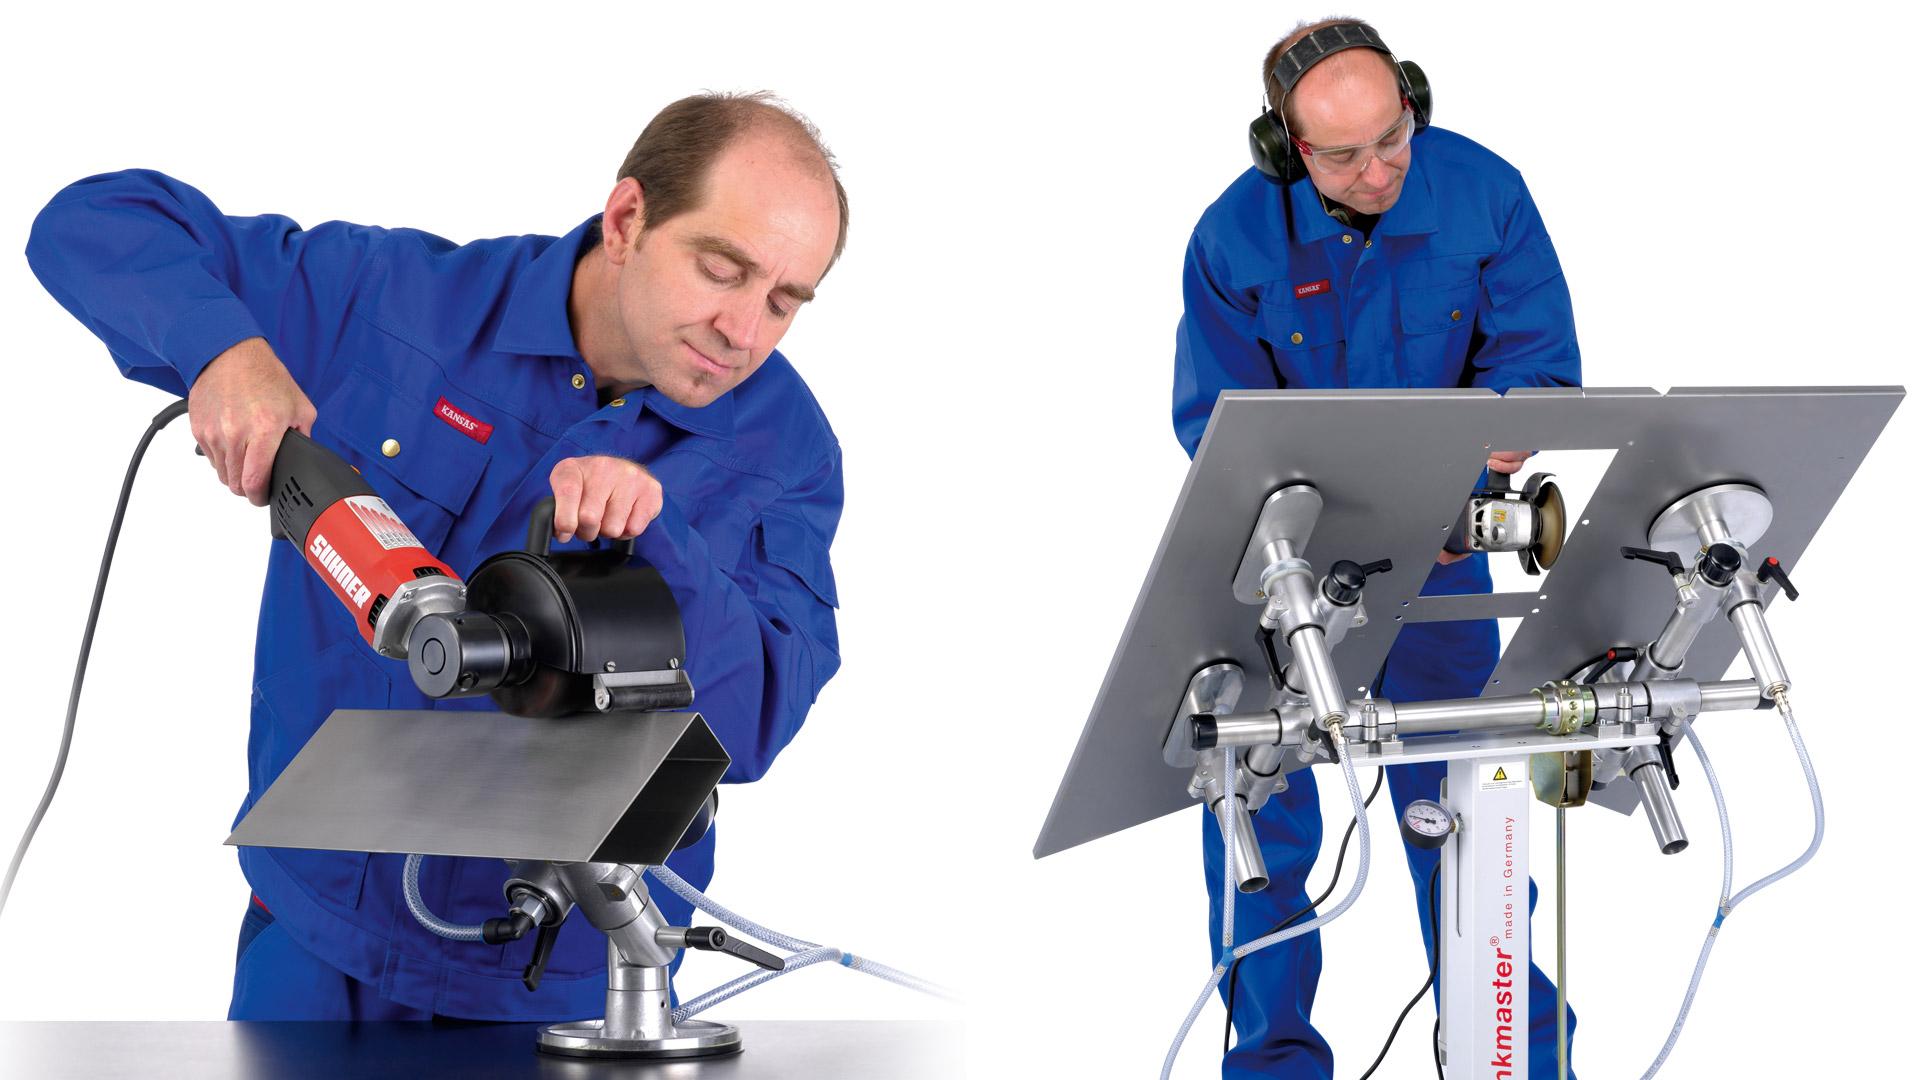 bankmaster Vakuumspannsystem für Metalloberflächen